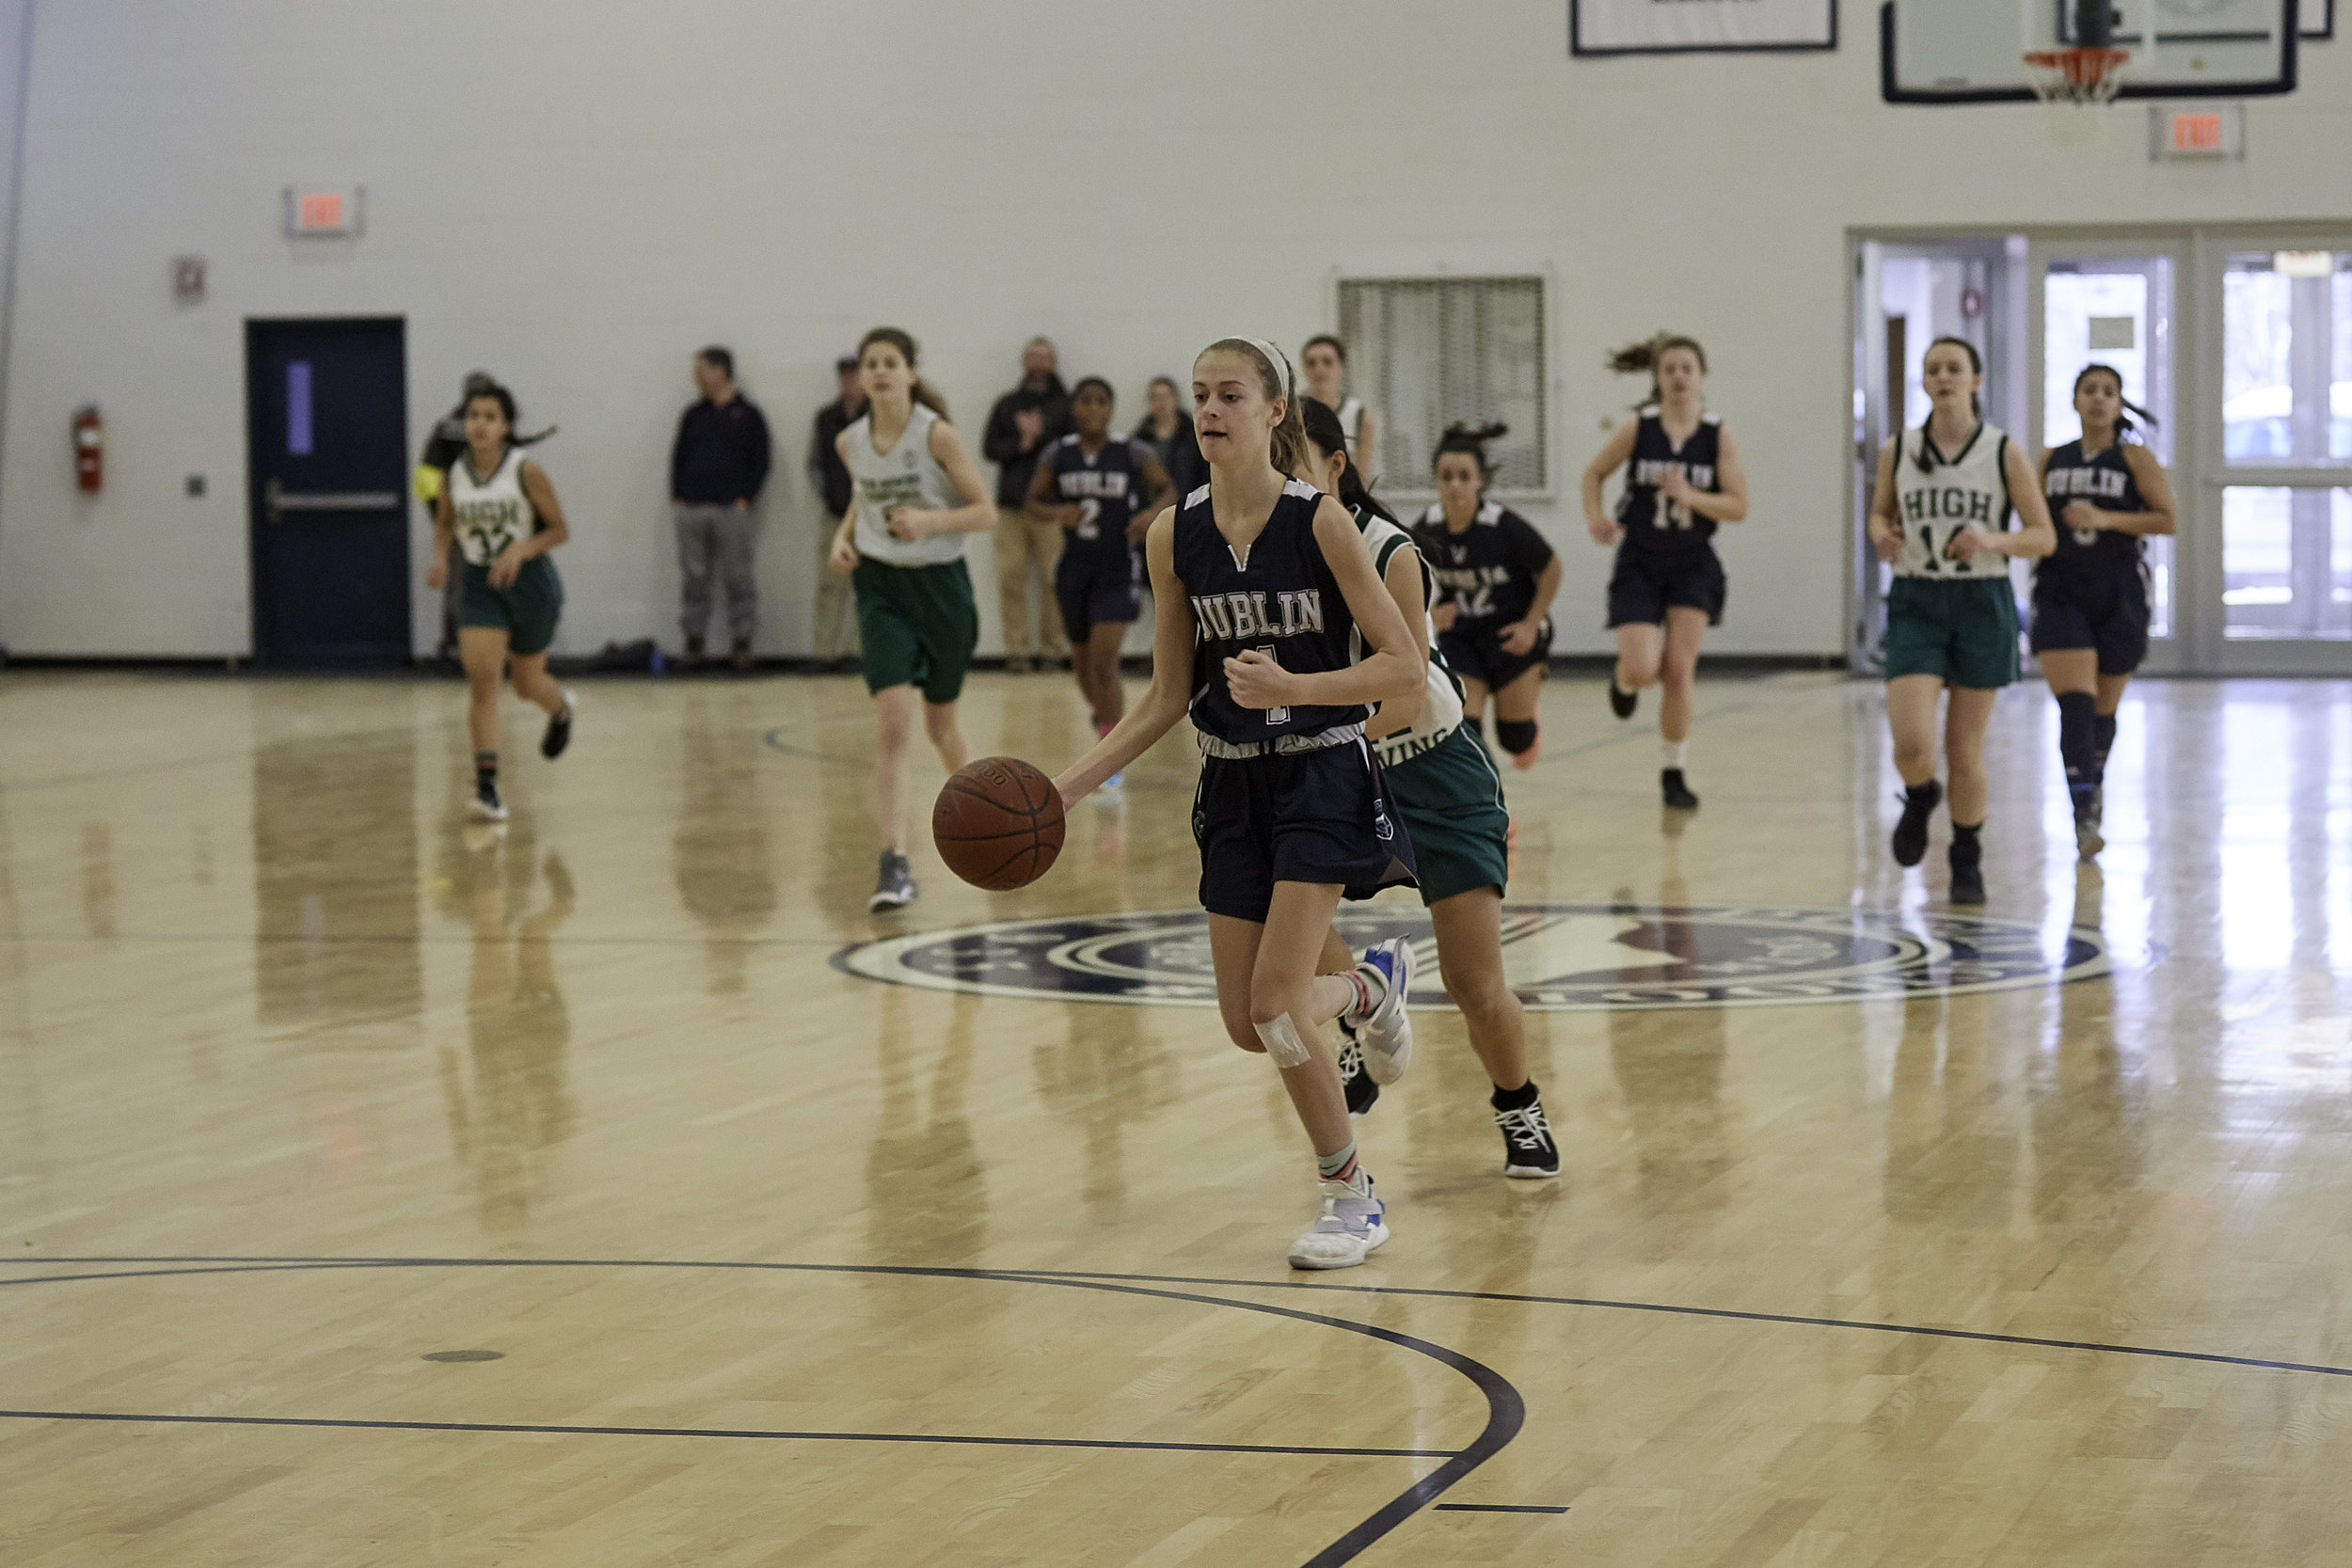 Basketball vs High Mowing School, February 2, 2019 - 166338.jpg